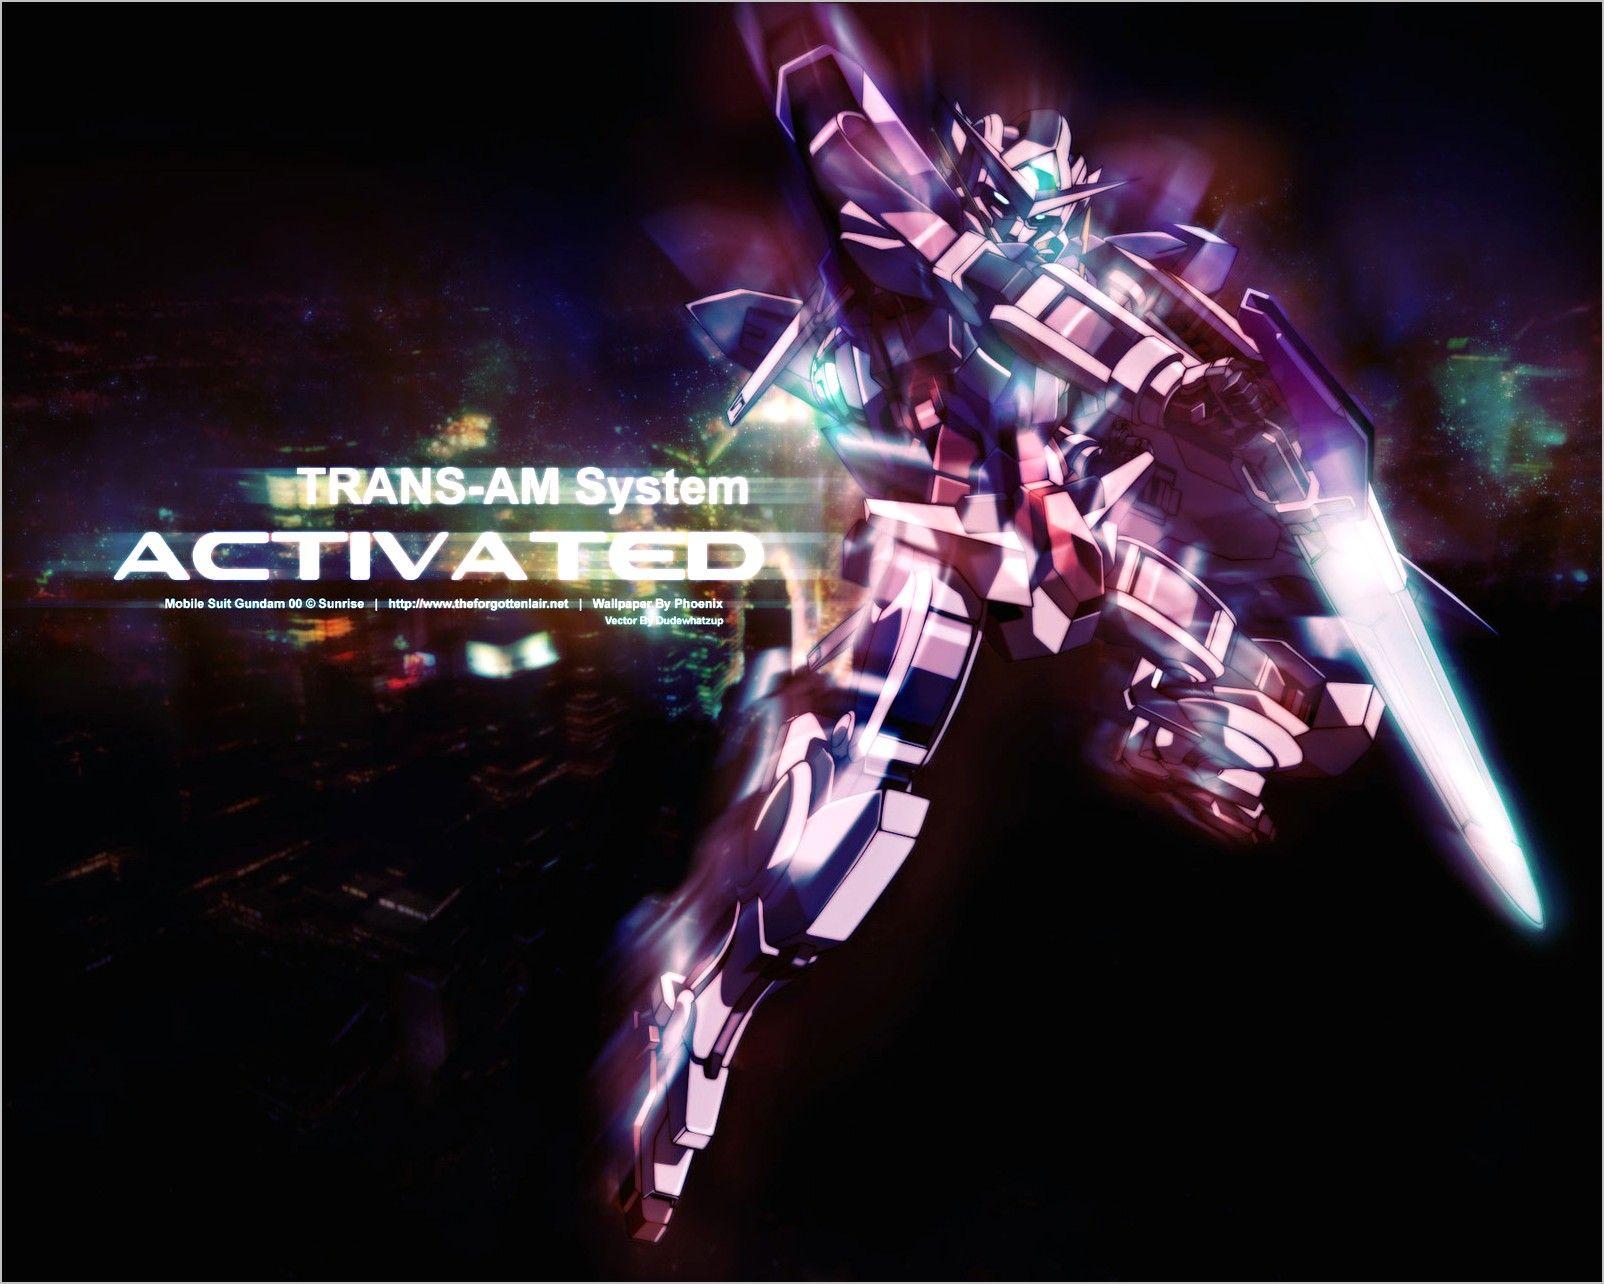 Gundam Exia Wallpaper 4k Gundam Exia Gundam Gundam Wallpapers Gundam exia wallpaper 4k